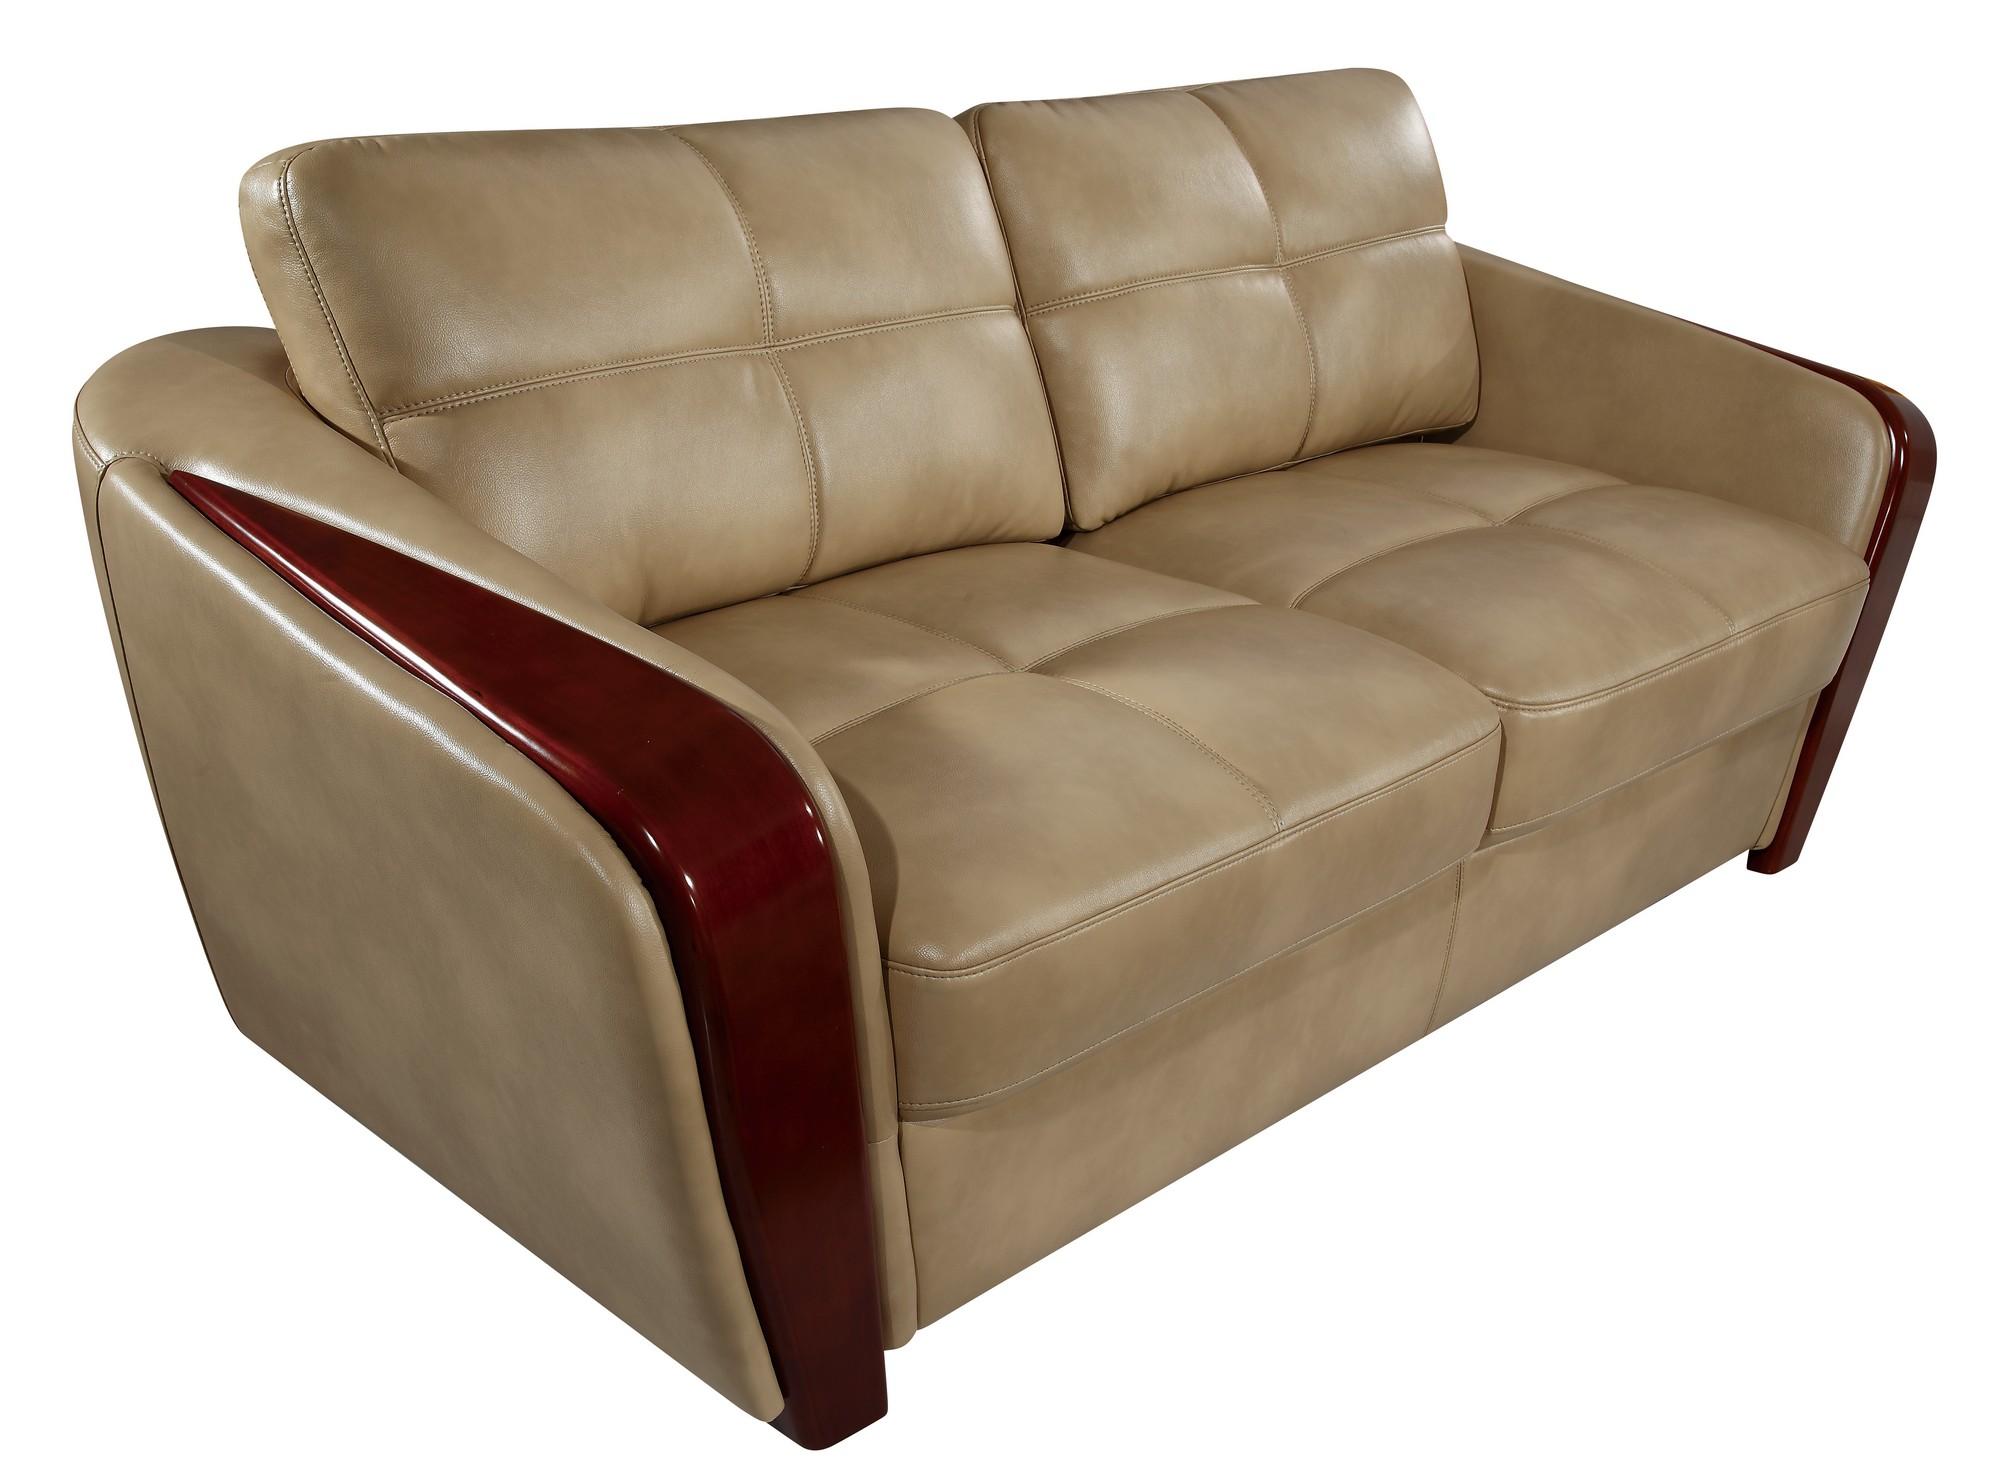 UFM206 Ivory Leather Gel Sofa by Global Furniture